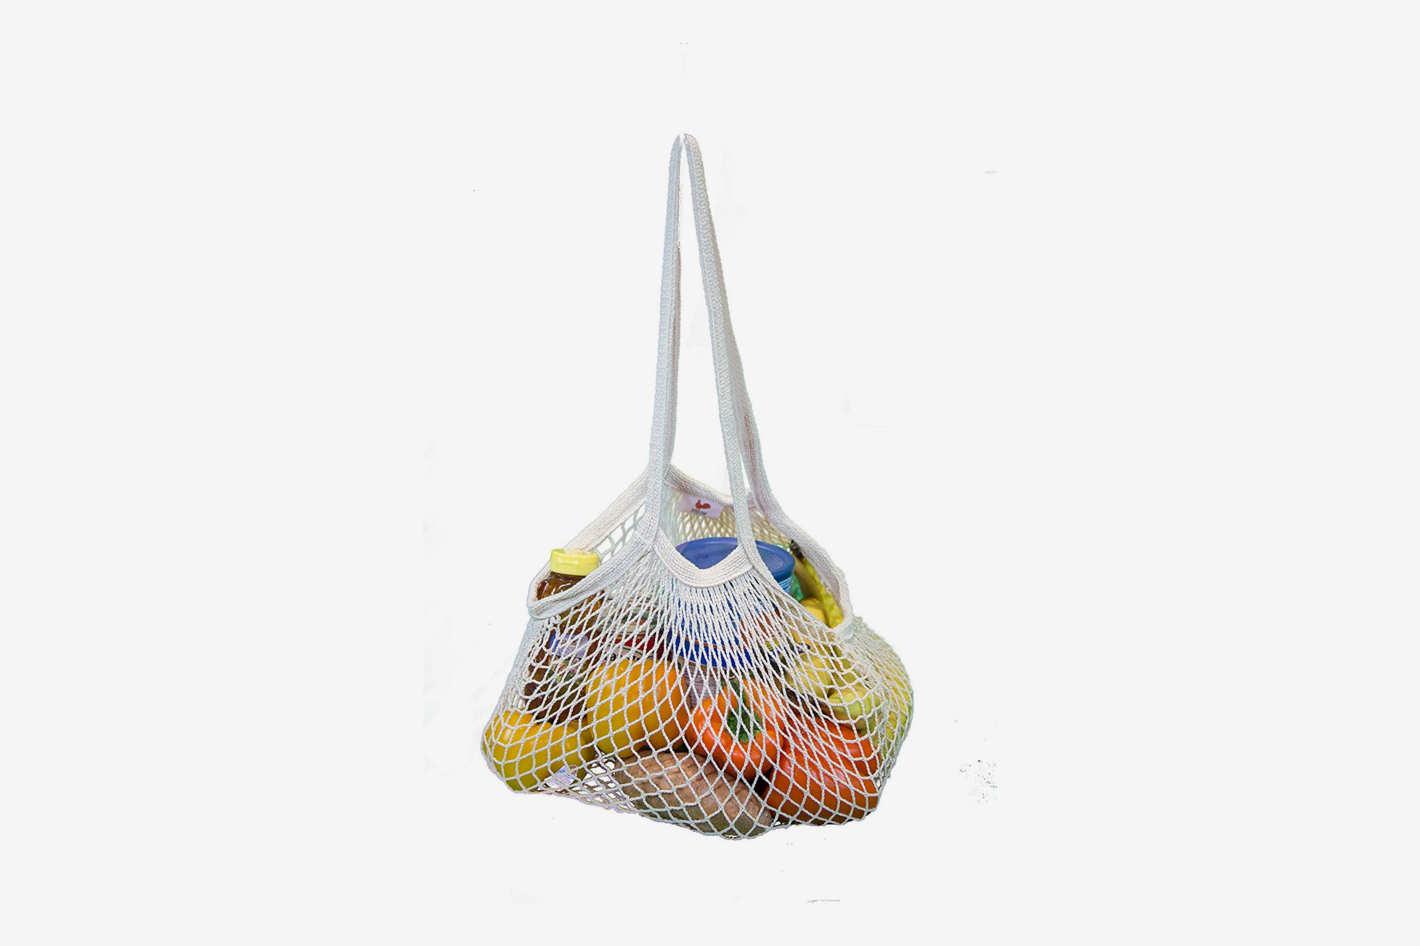 EuroSac Natural Cotton String Bag (3, Long Handle)